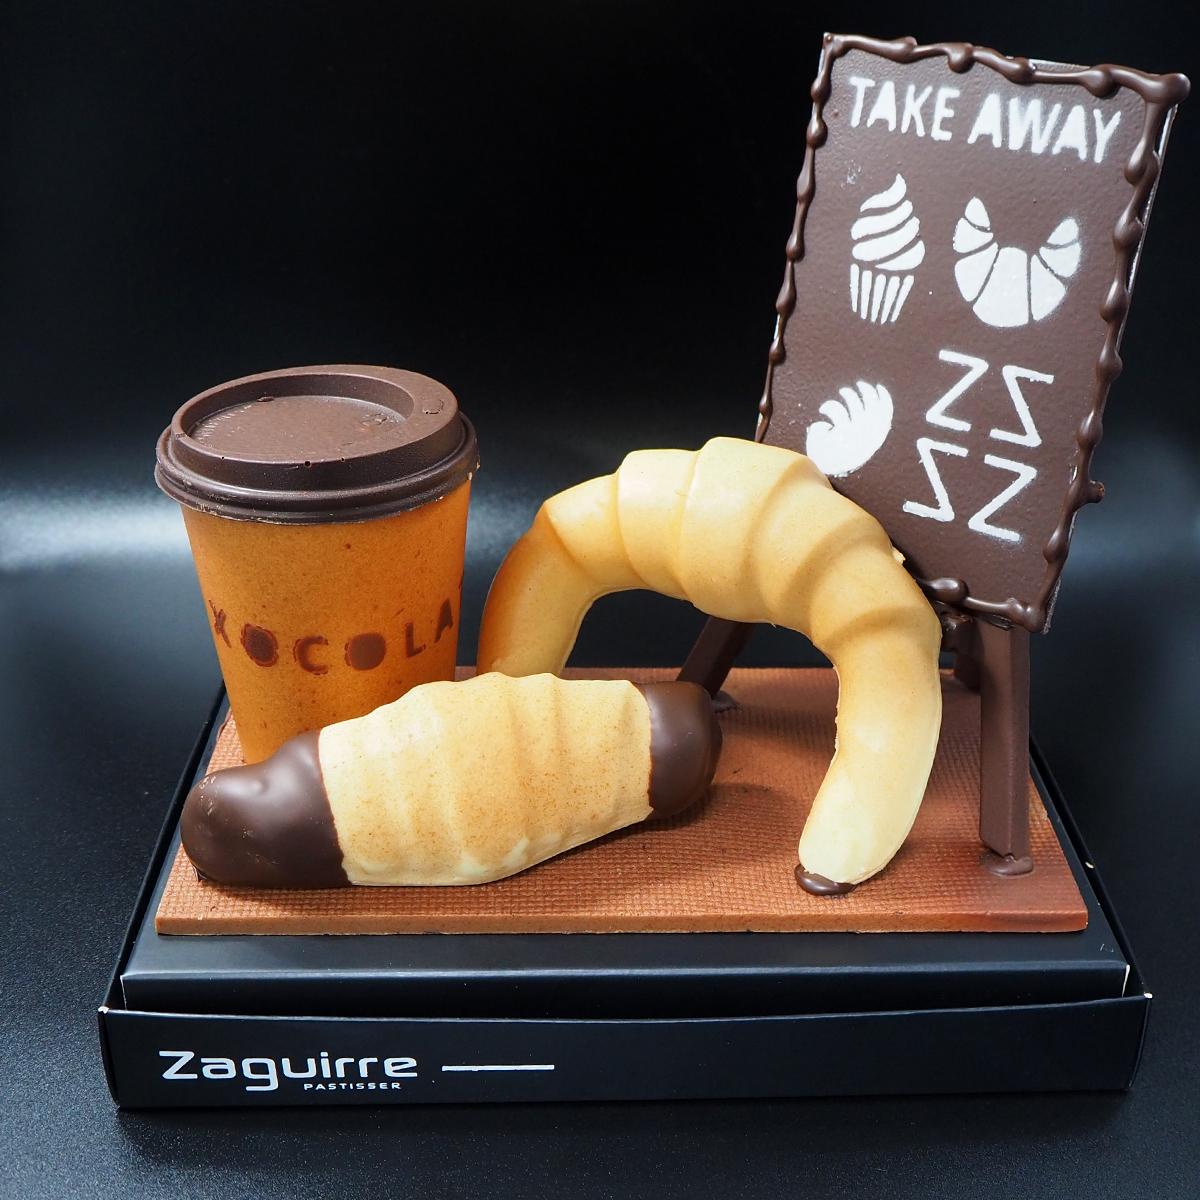 mona de chocolate take away